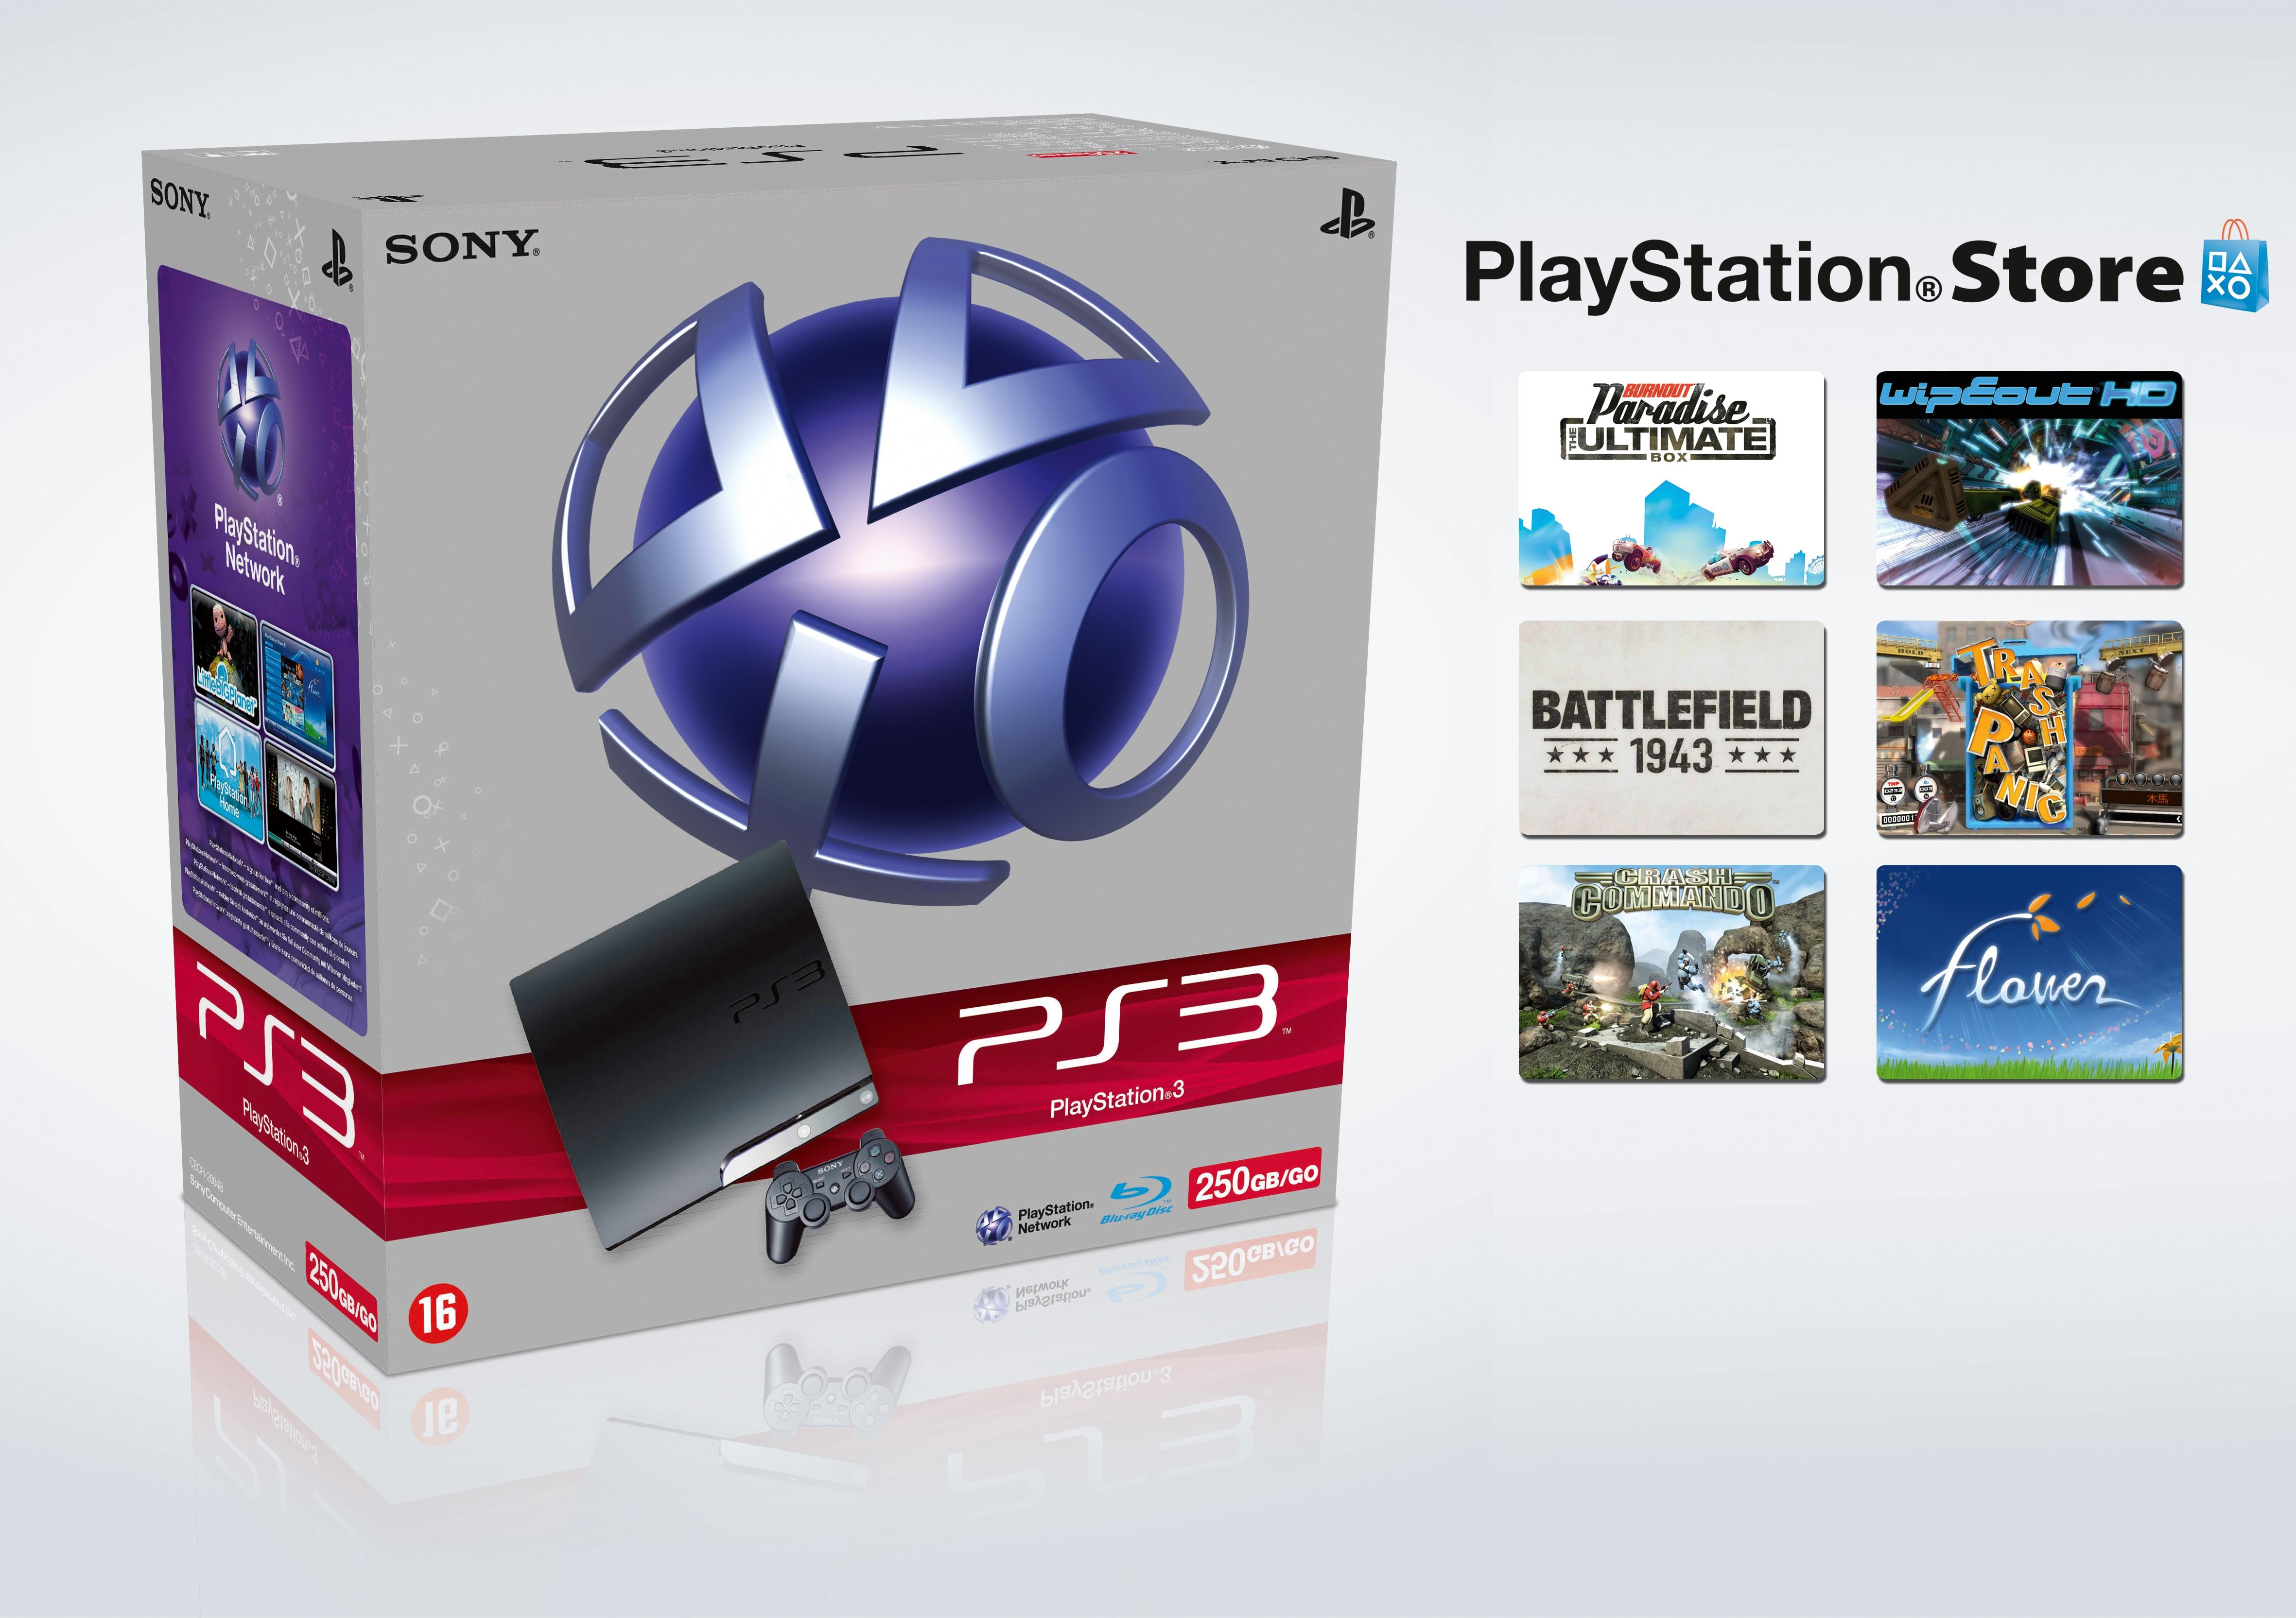 Sony PlayStation 3 Slim 250GB + PSN Voucher